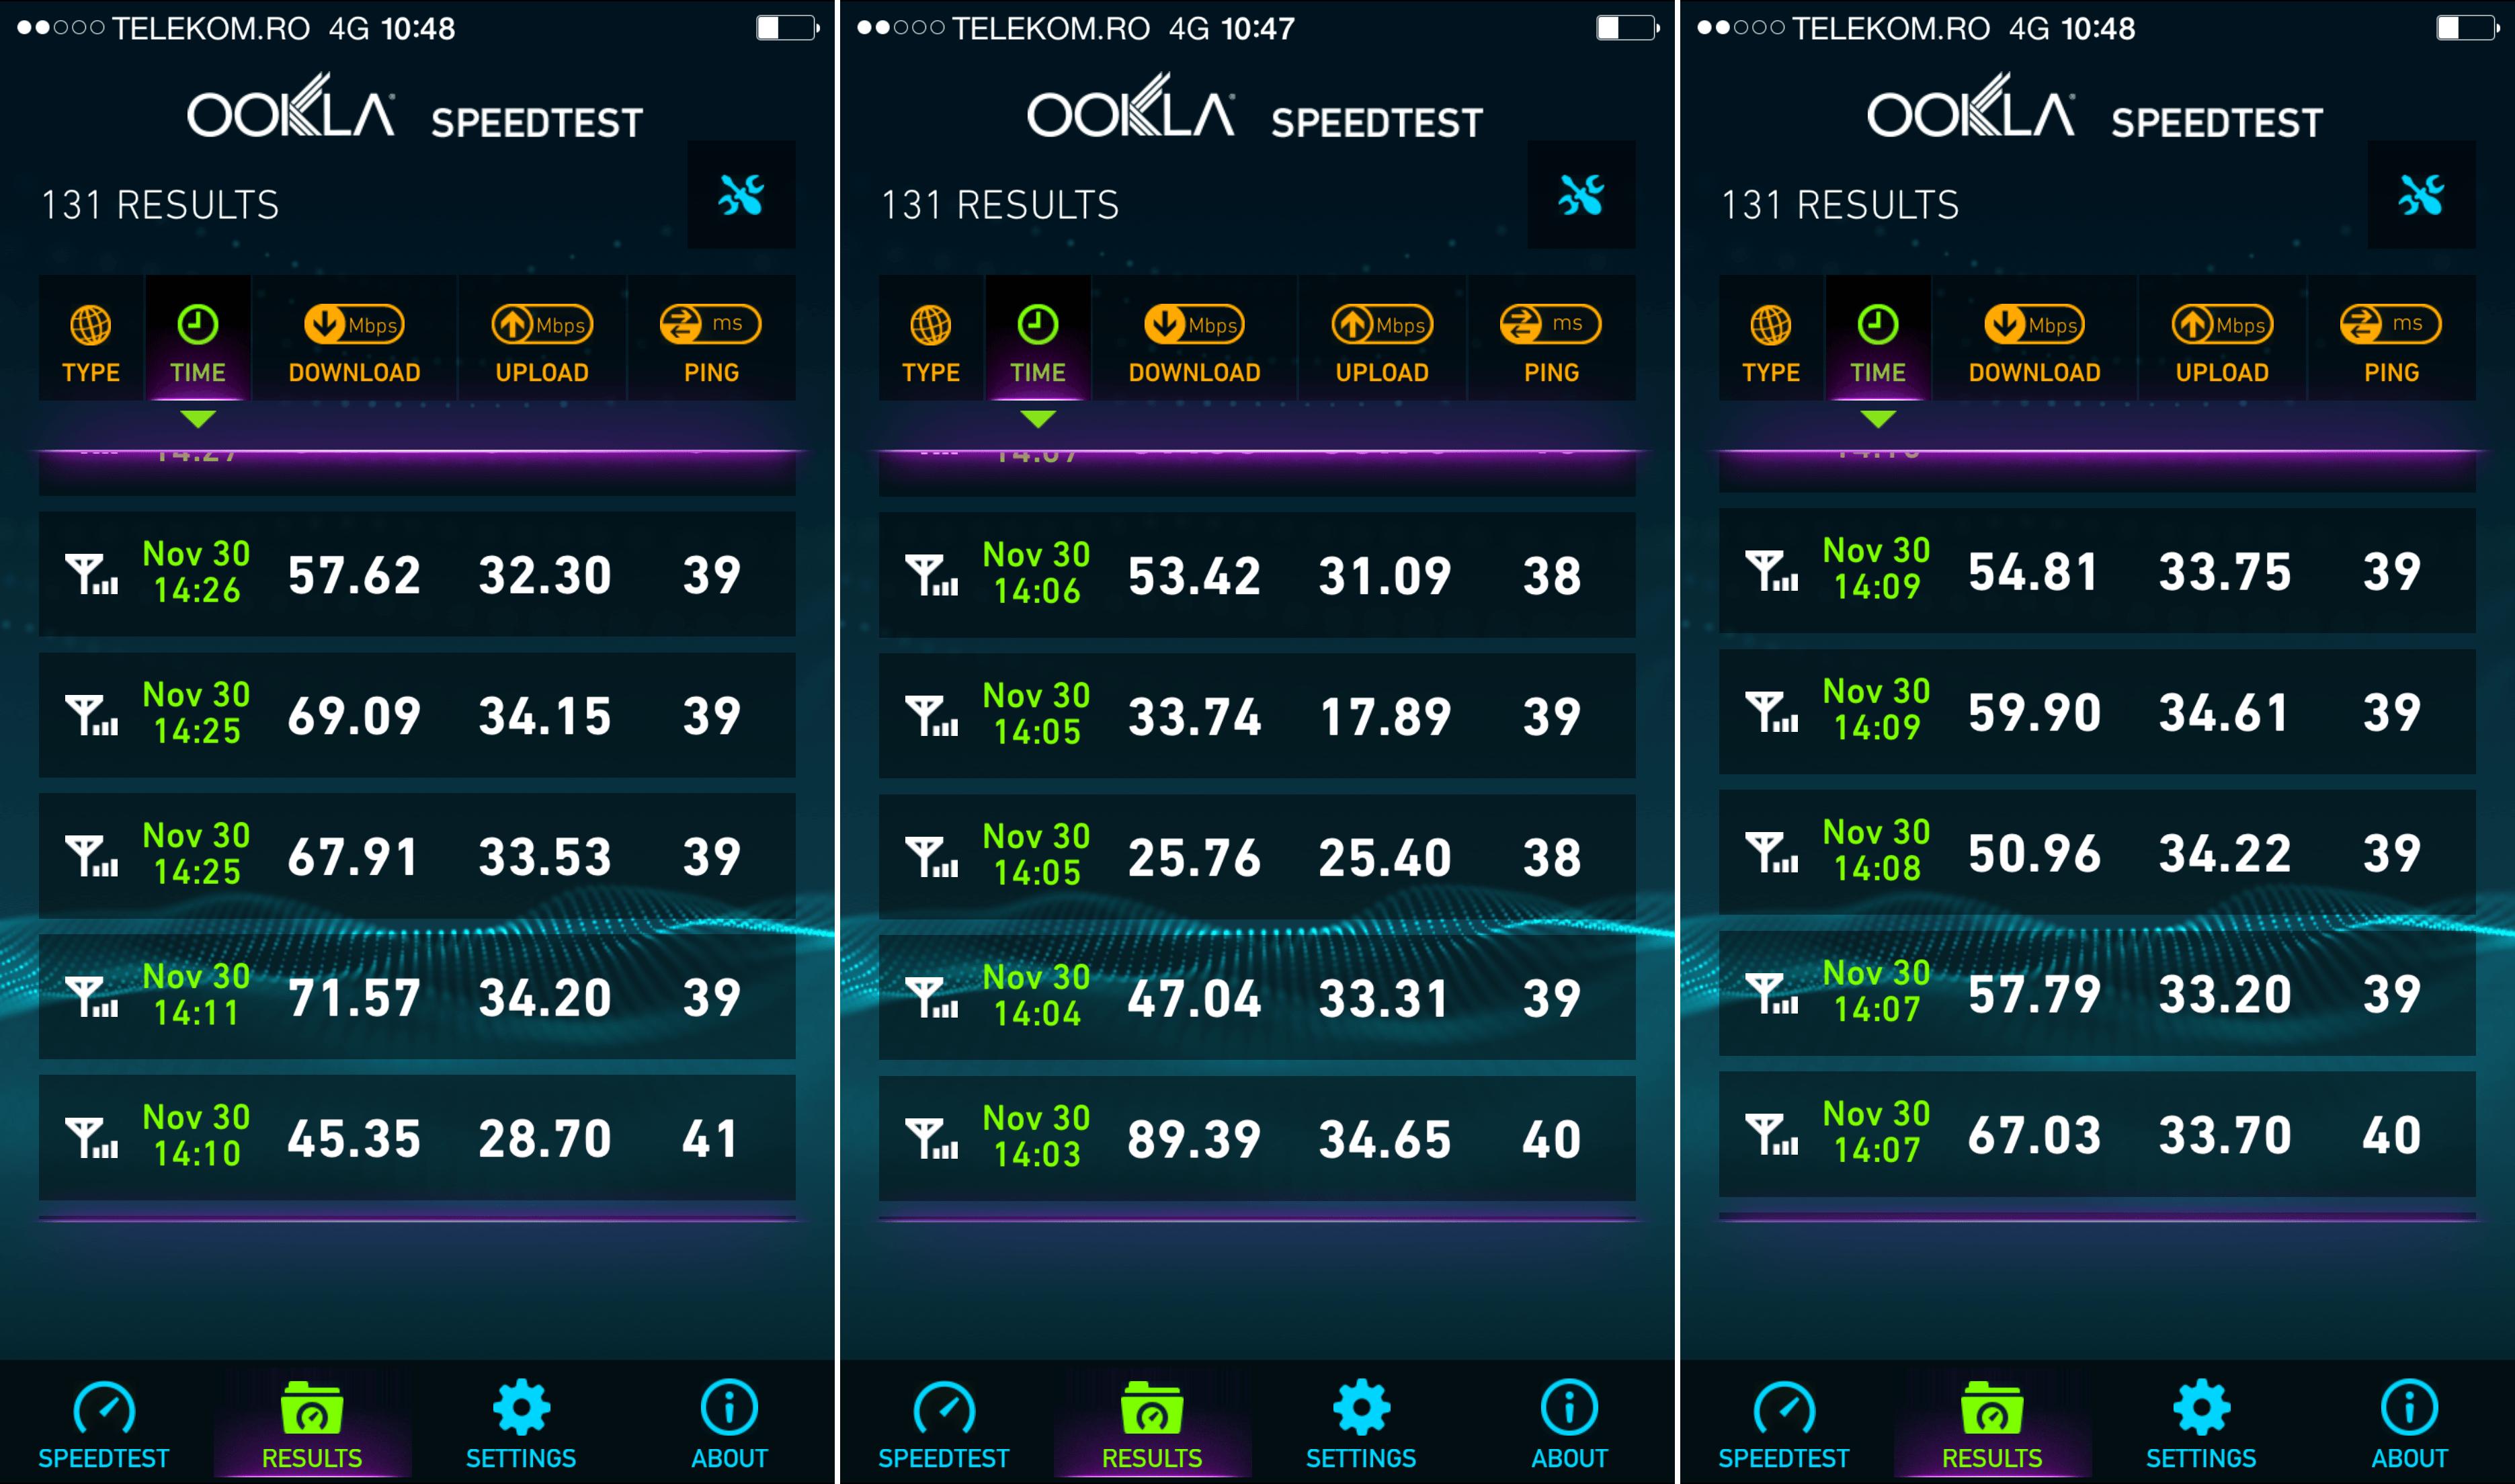 Internetul Telekom 4G test viteza 1